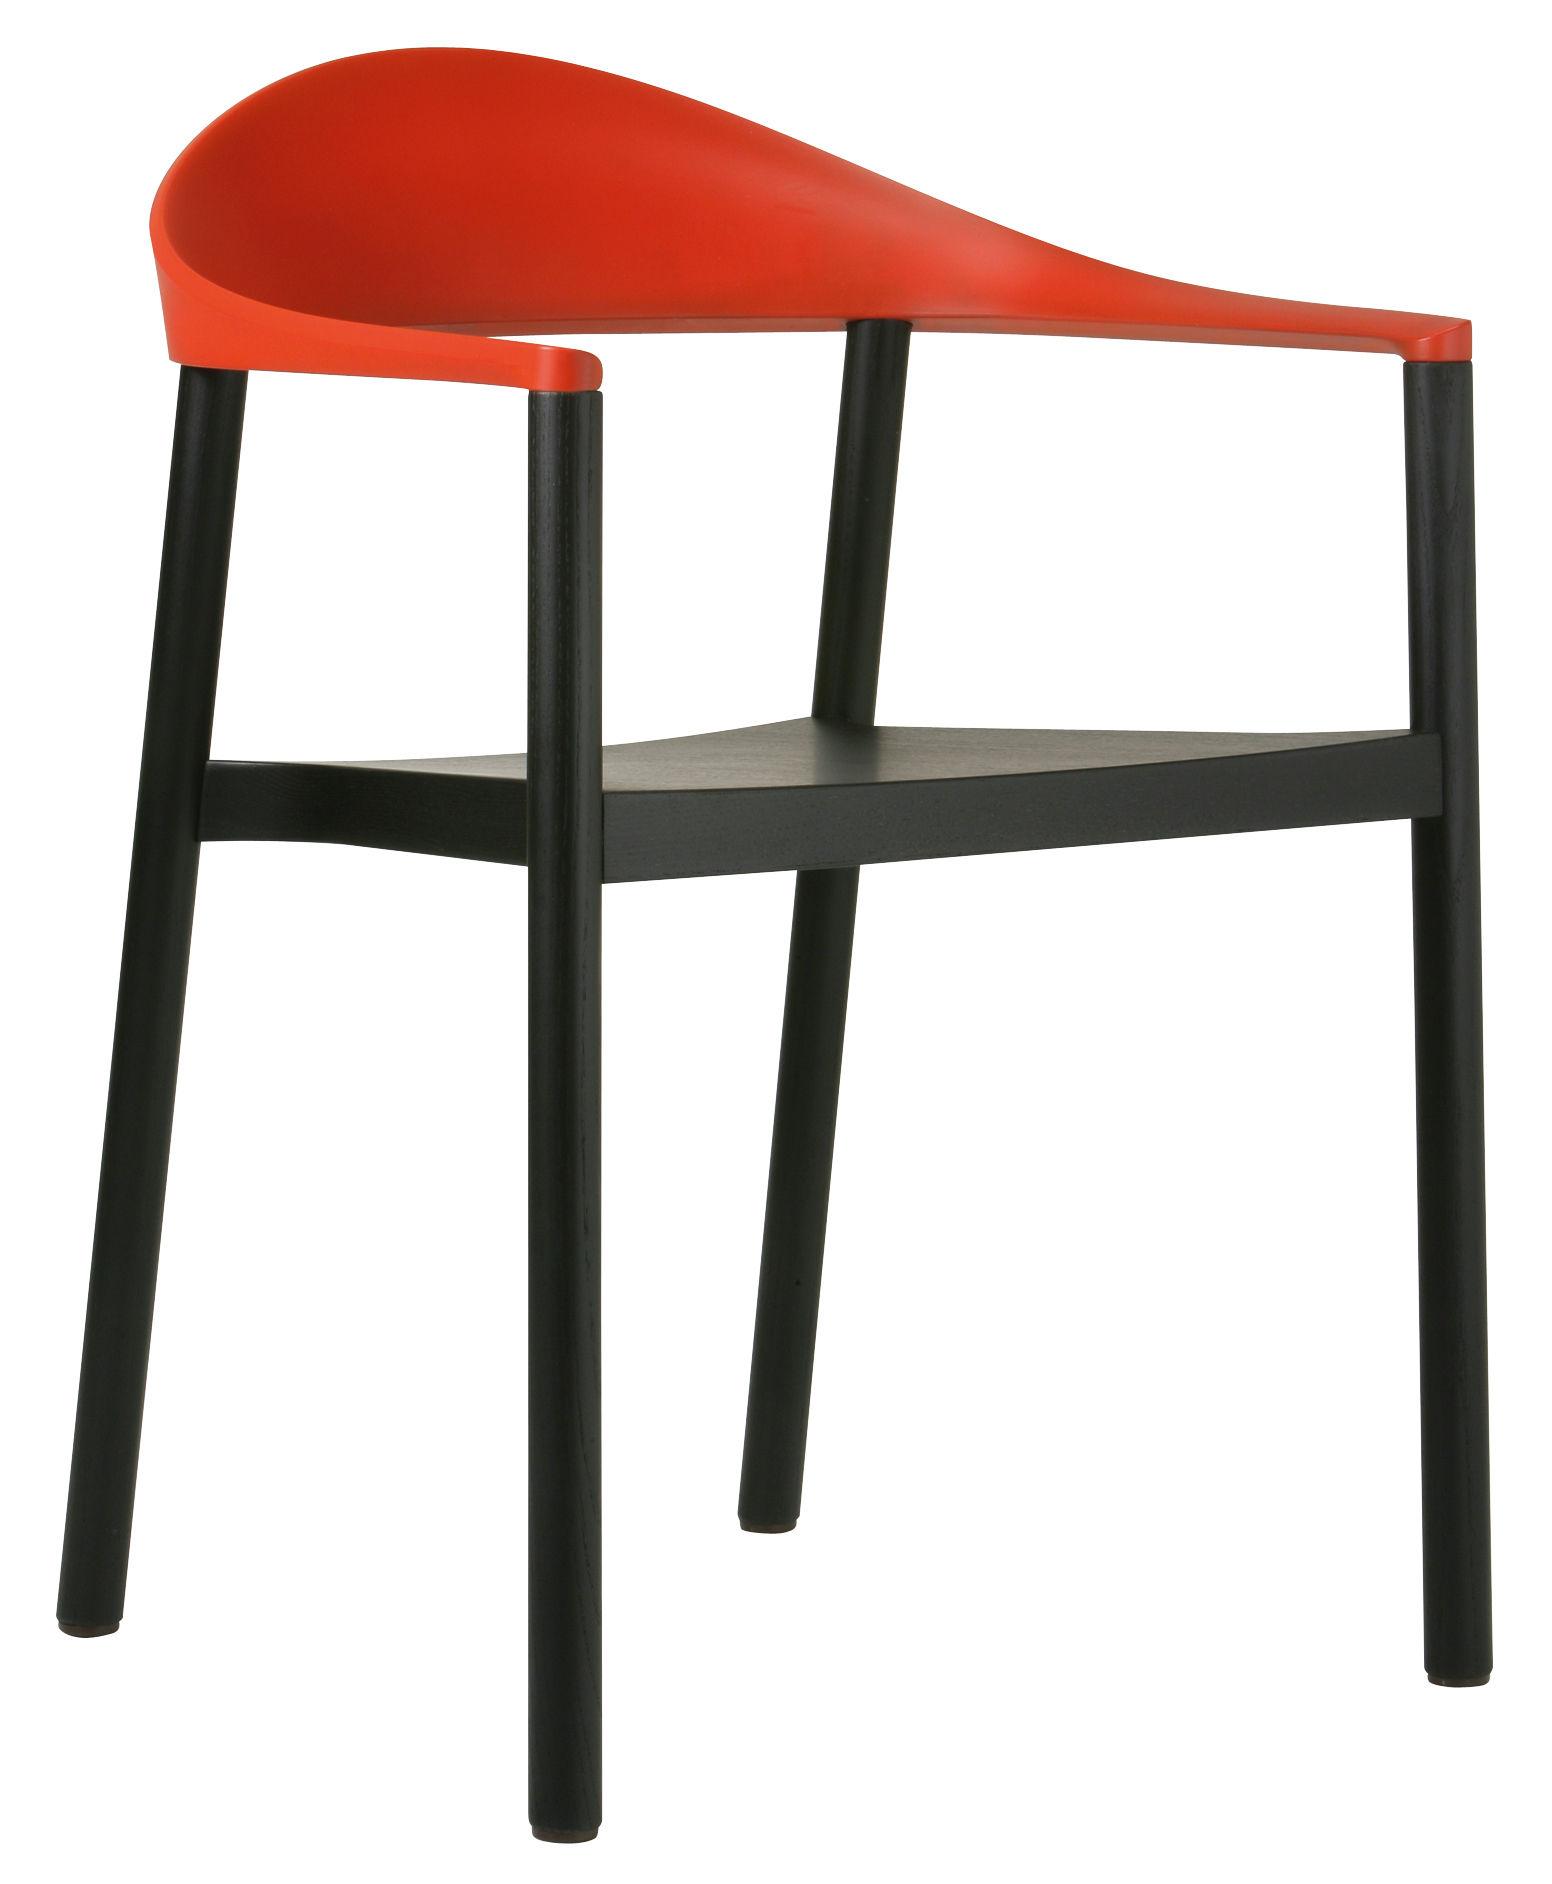 Möbel - Stühle  - Monza Stapelbarer Sessel Gestell schwarzes Holz - Plank - Schwarz - Lehne rot - lackierte Esche, Polypropylen